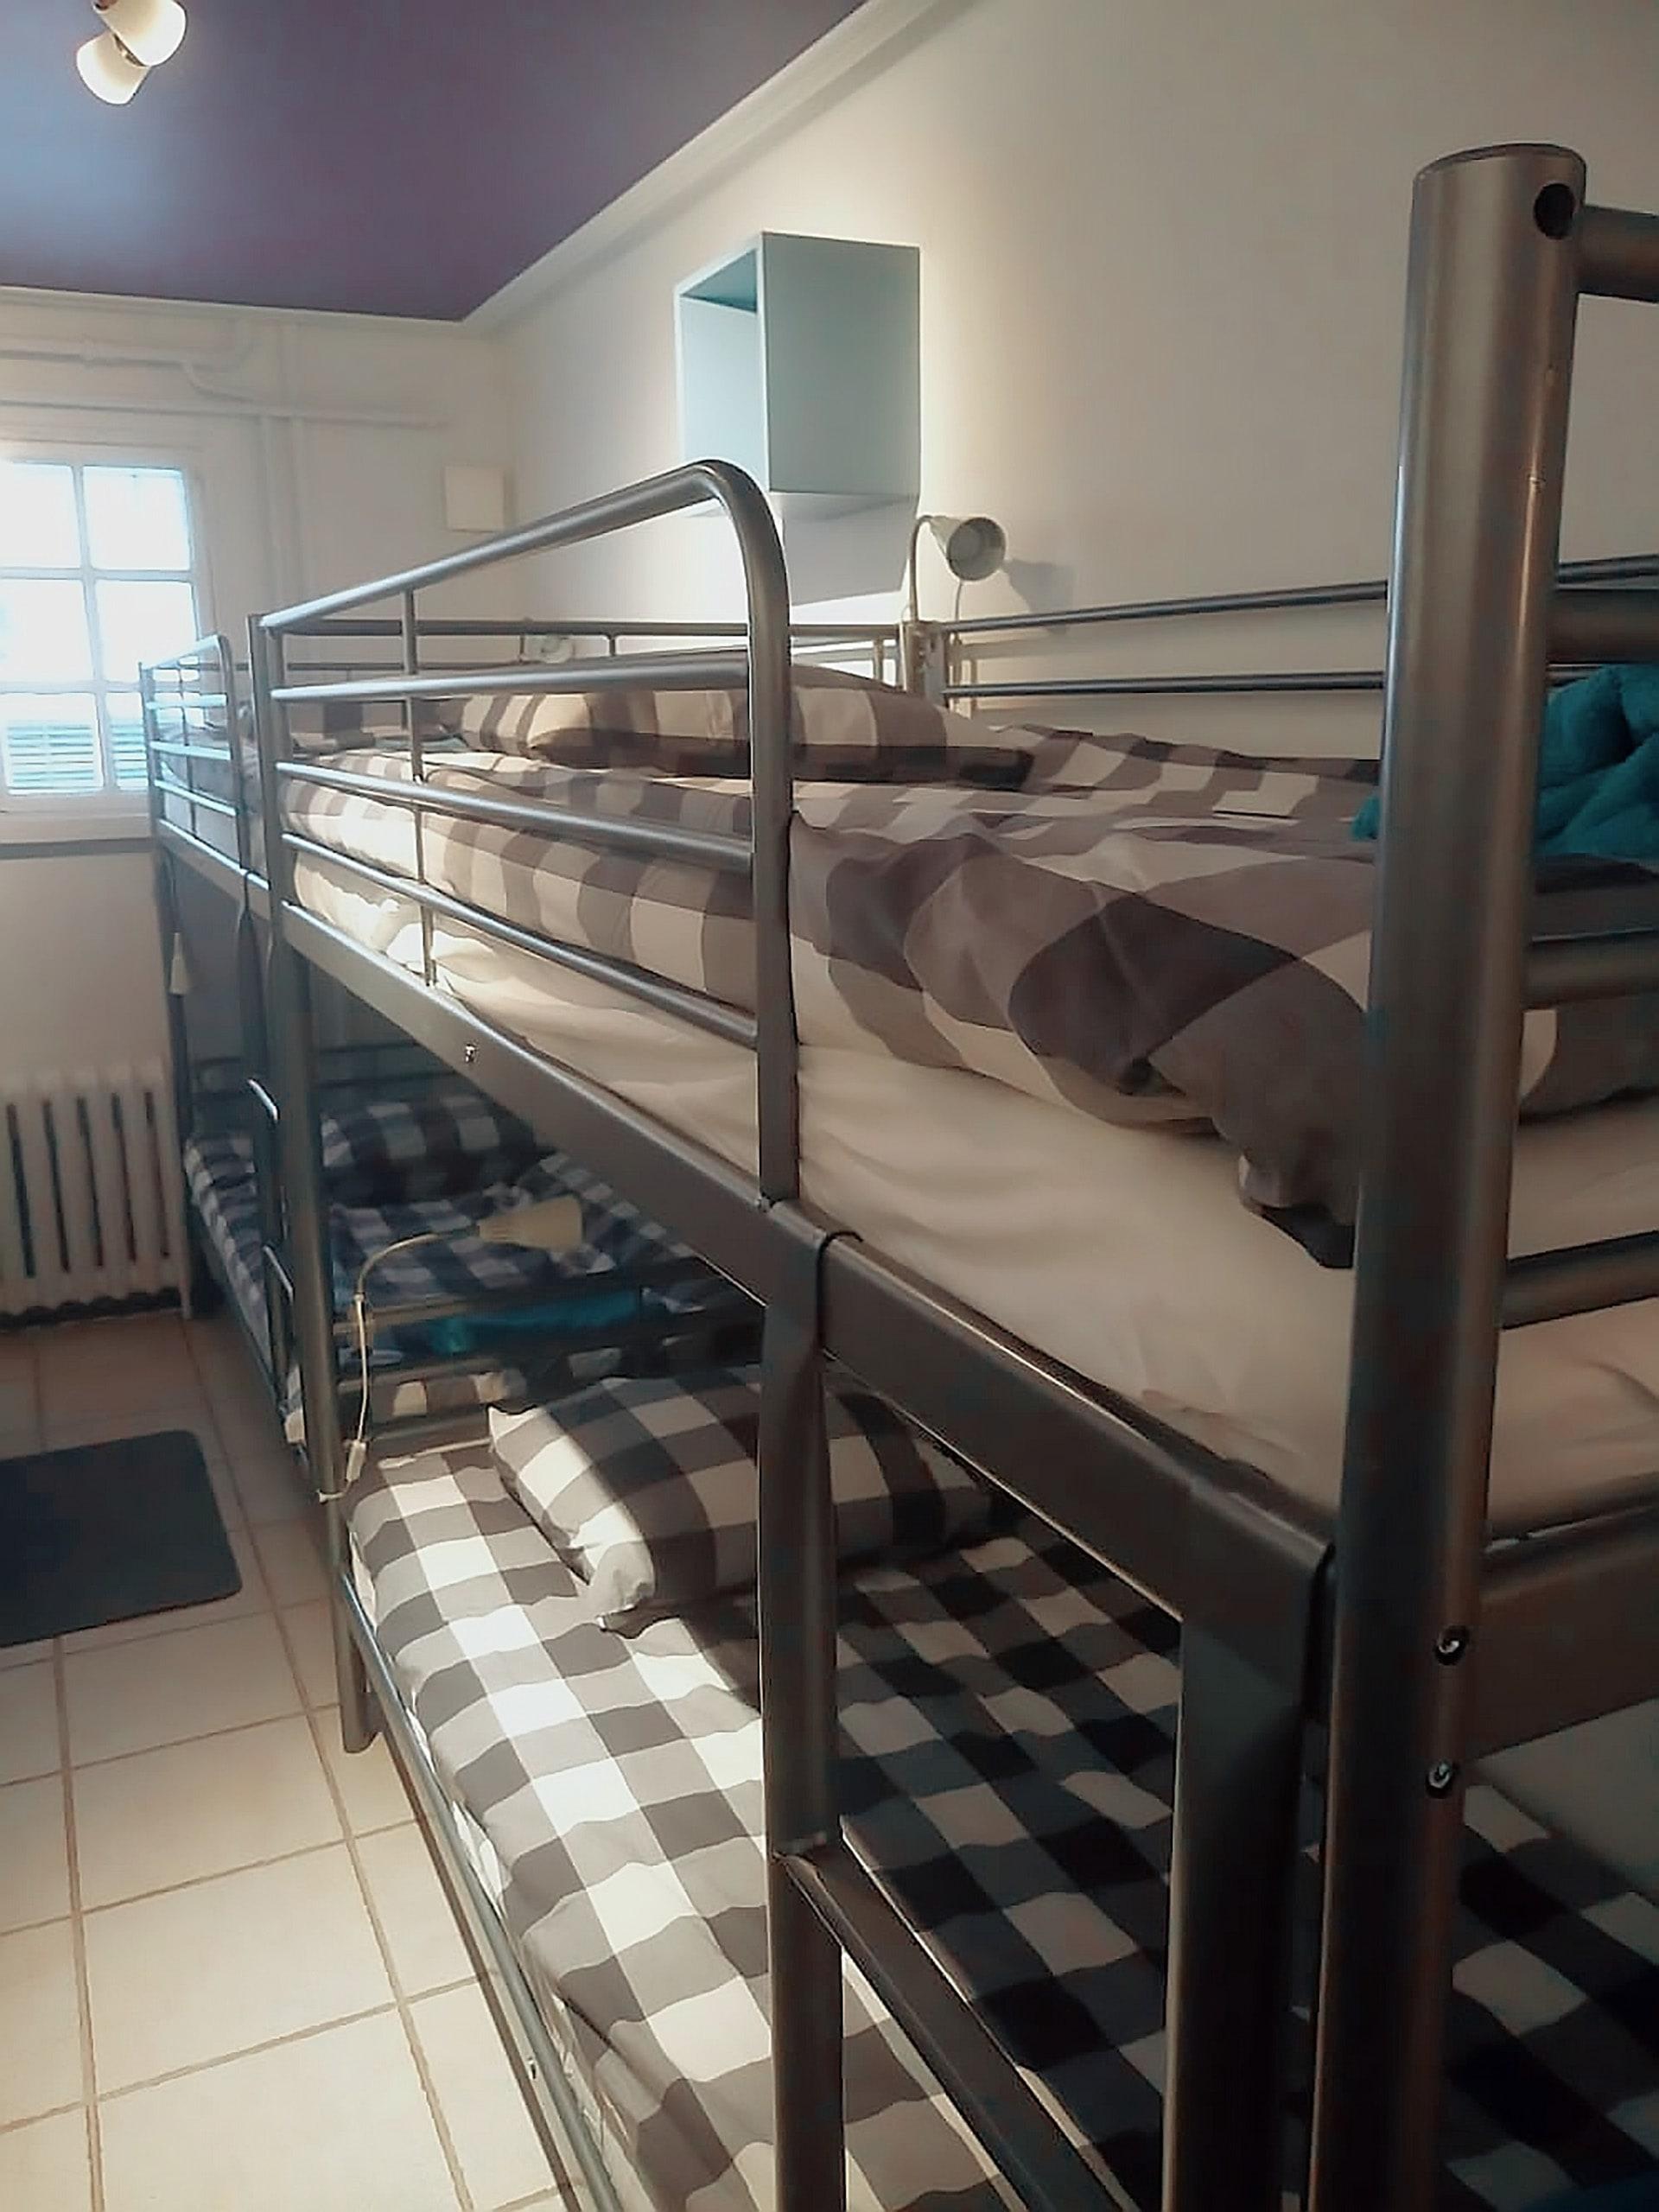 HOSTEL - Poshtel Turku Hostel